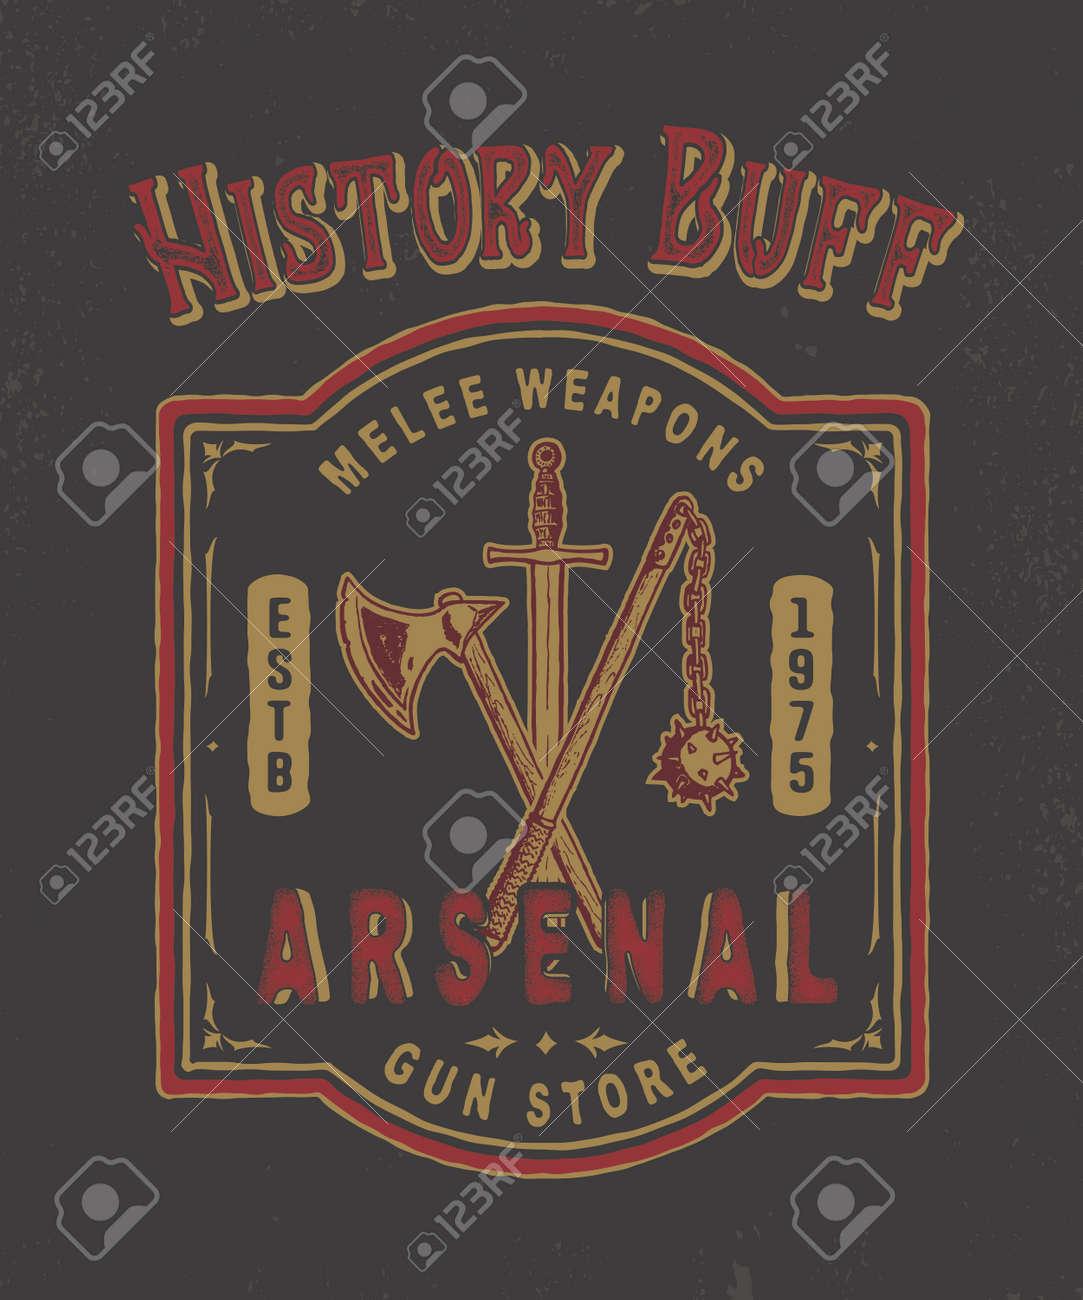 Arsenal t shirt templates free download.